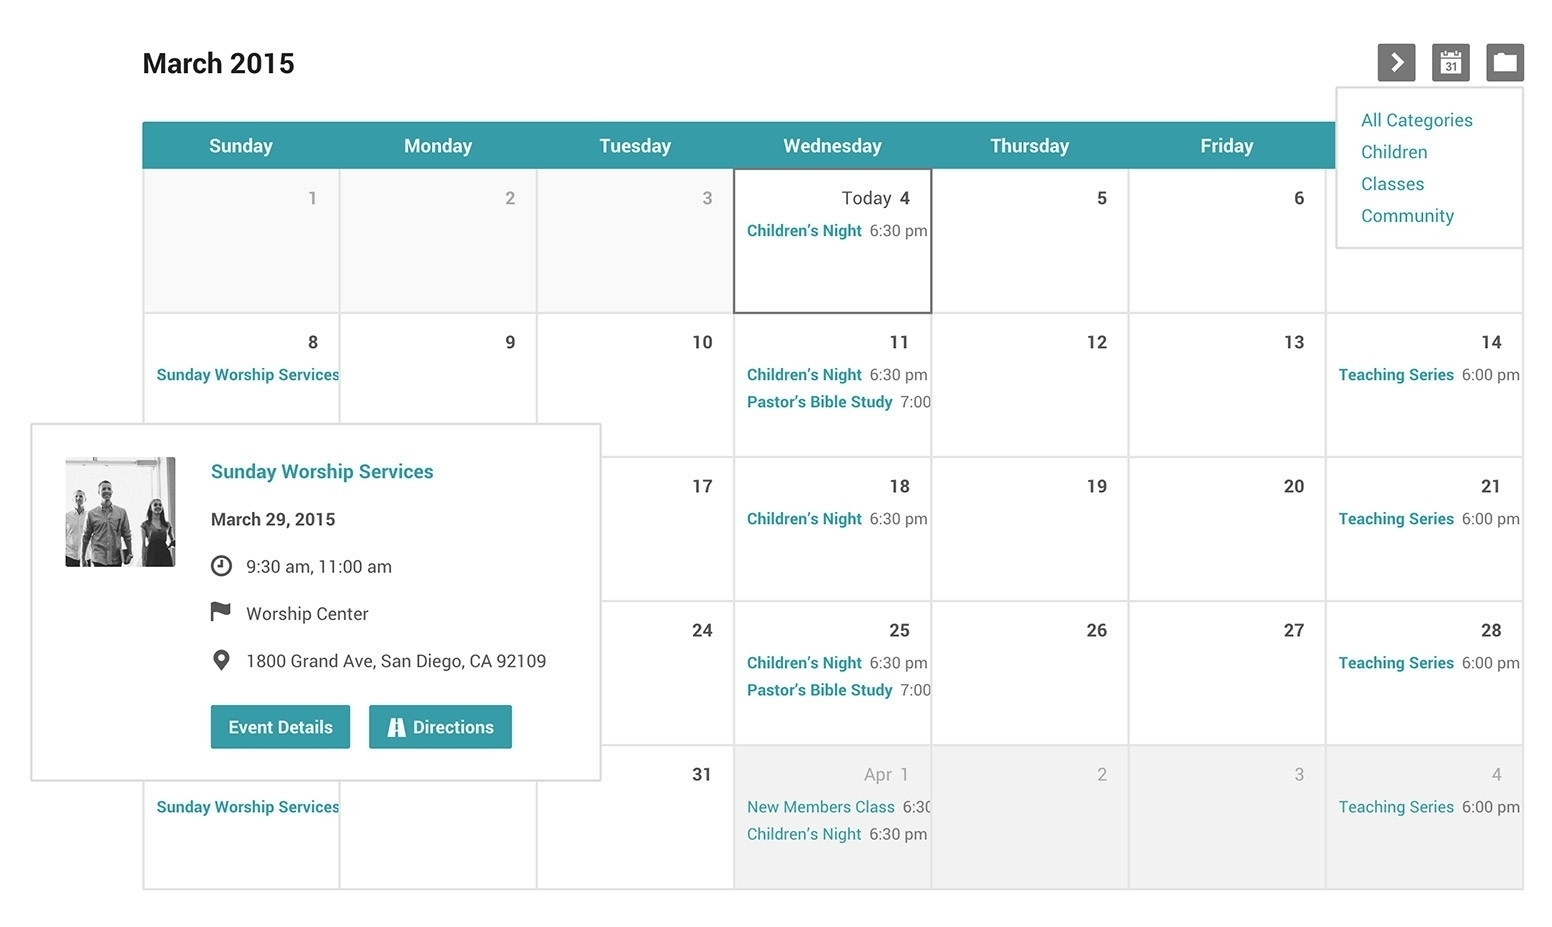 Depo Provera Propetual Calender – Template Calendar Design